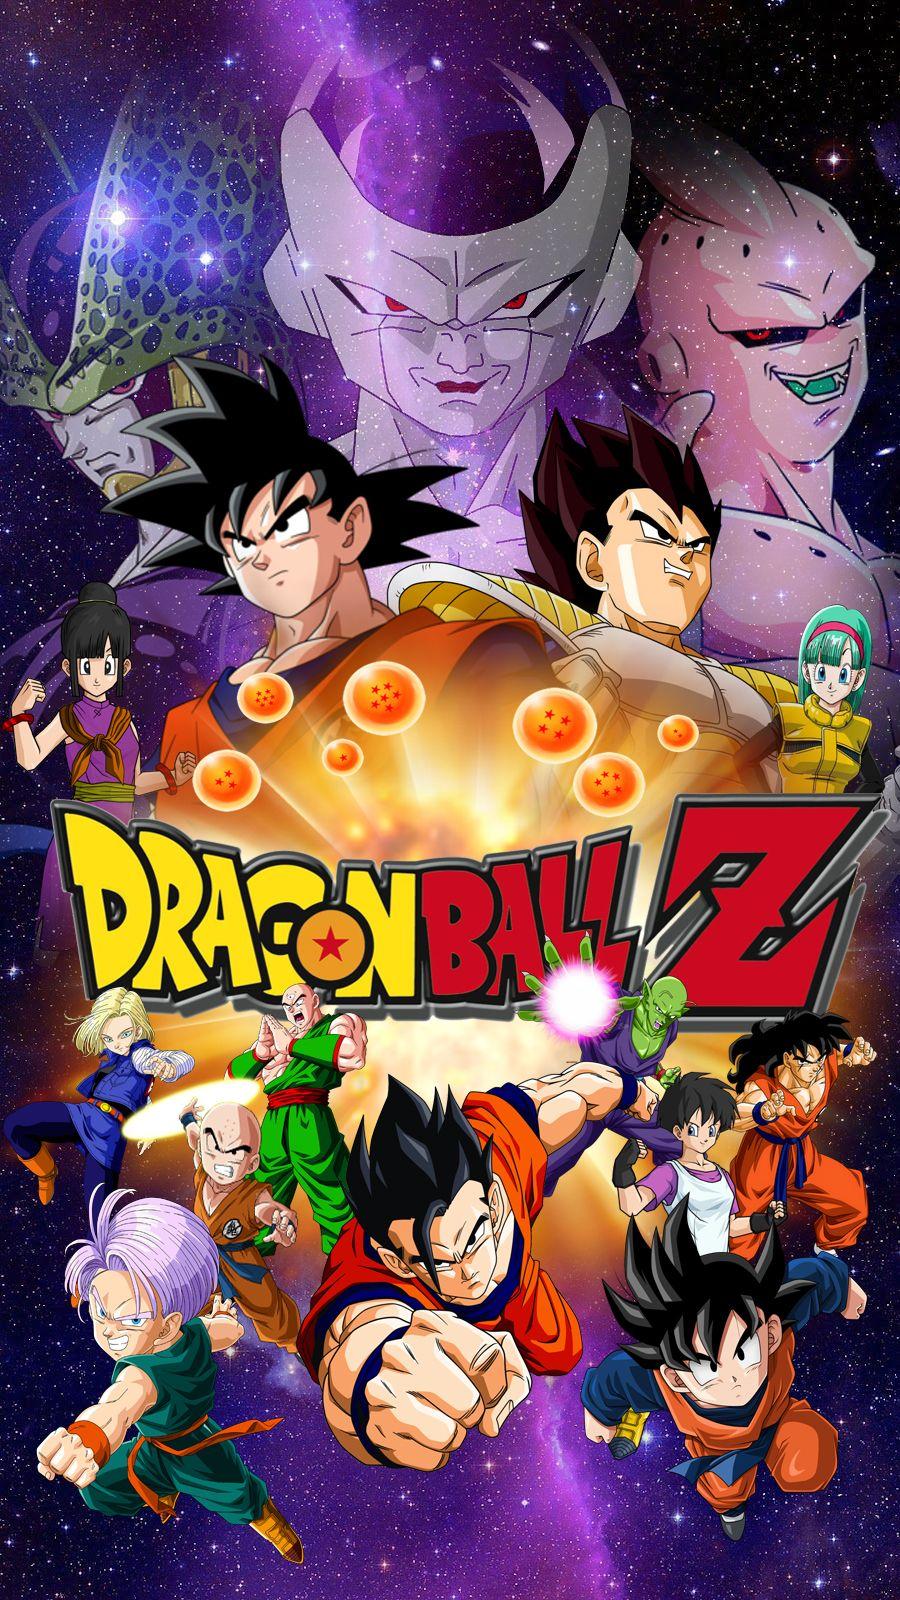 Dragon Ball Z Iphone Wallpaper Hd By Joshua121penalba On Deviantart Dragon Ball Z Iphone Wallpaper Anime Dragon Ball Super Dragon Ball Super Artwork